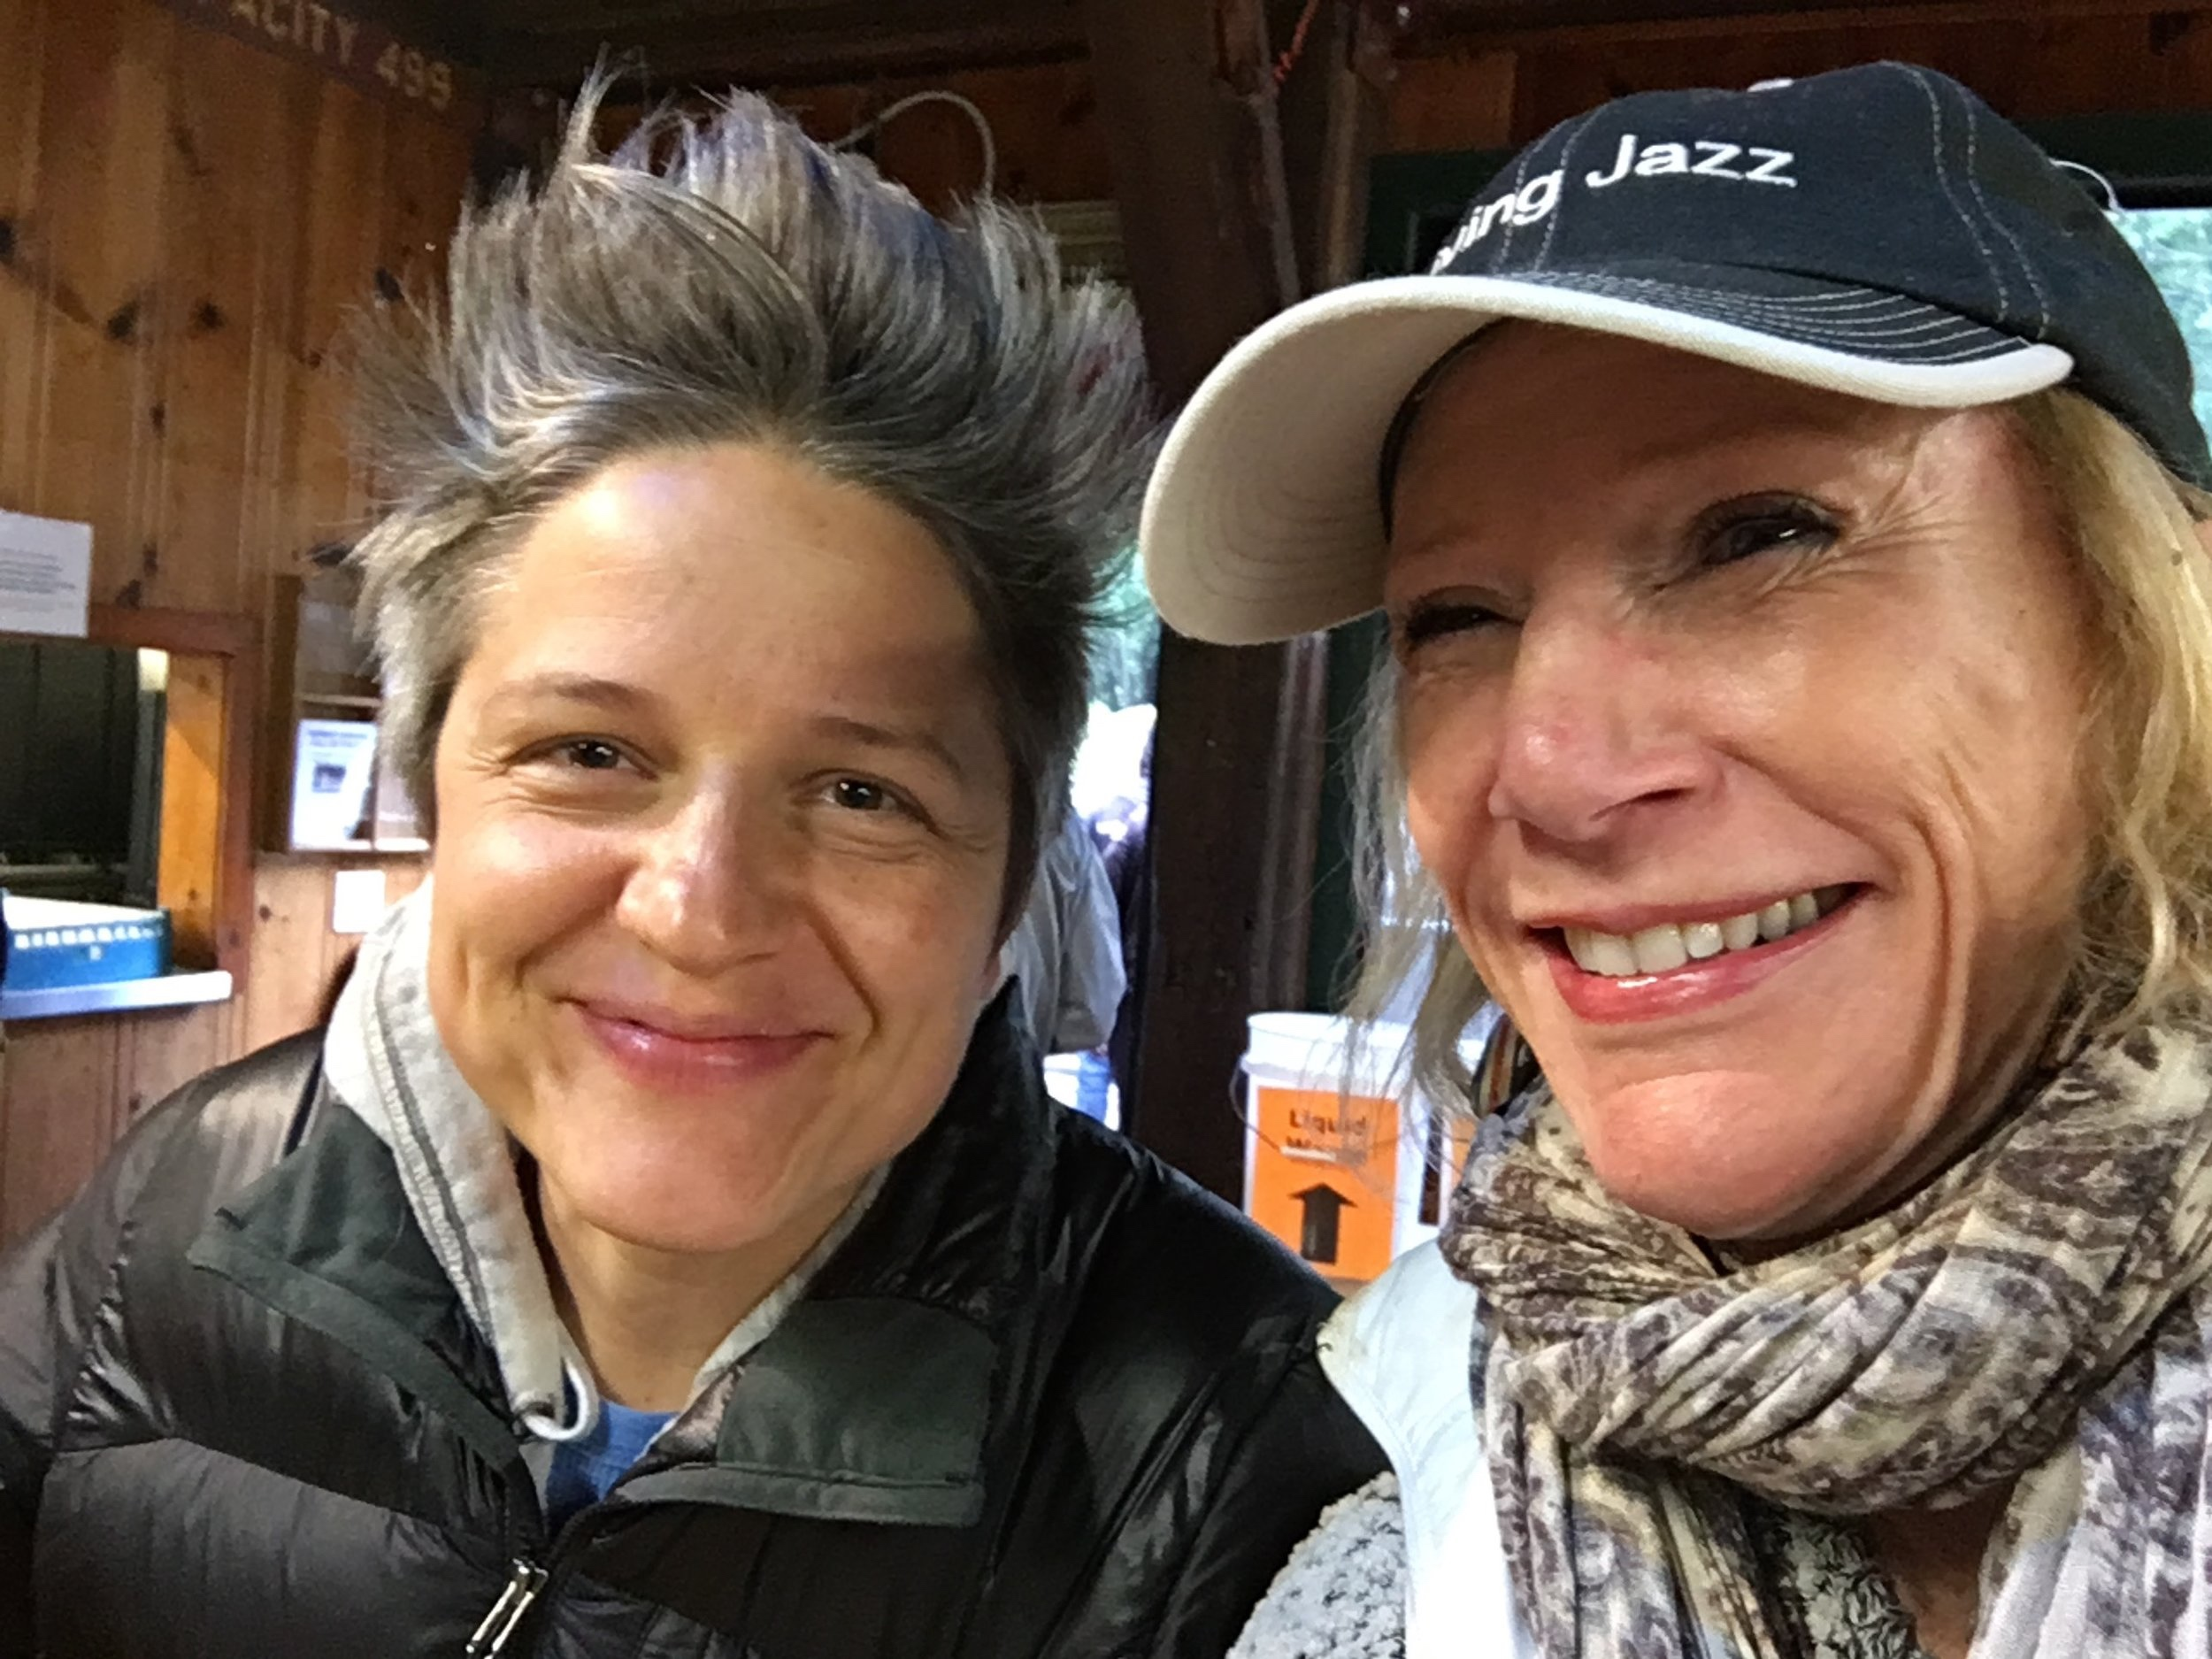 Jazz Camp West Director, Allison Miller